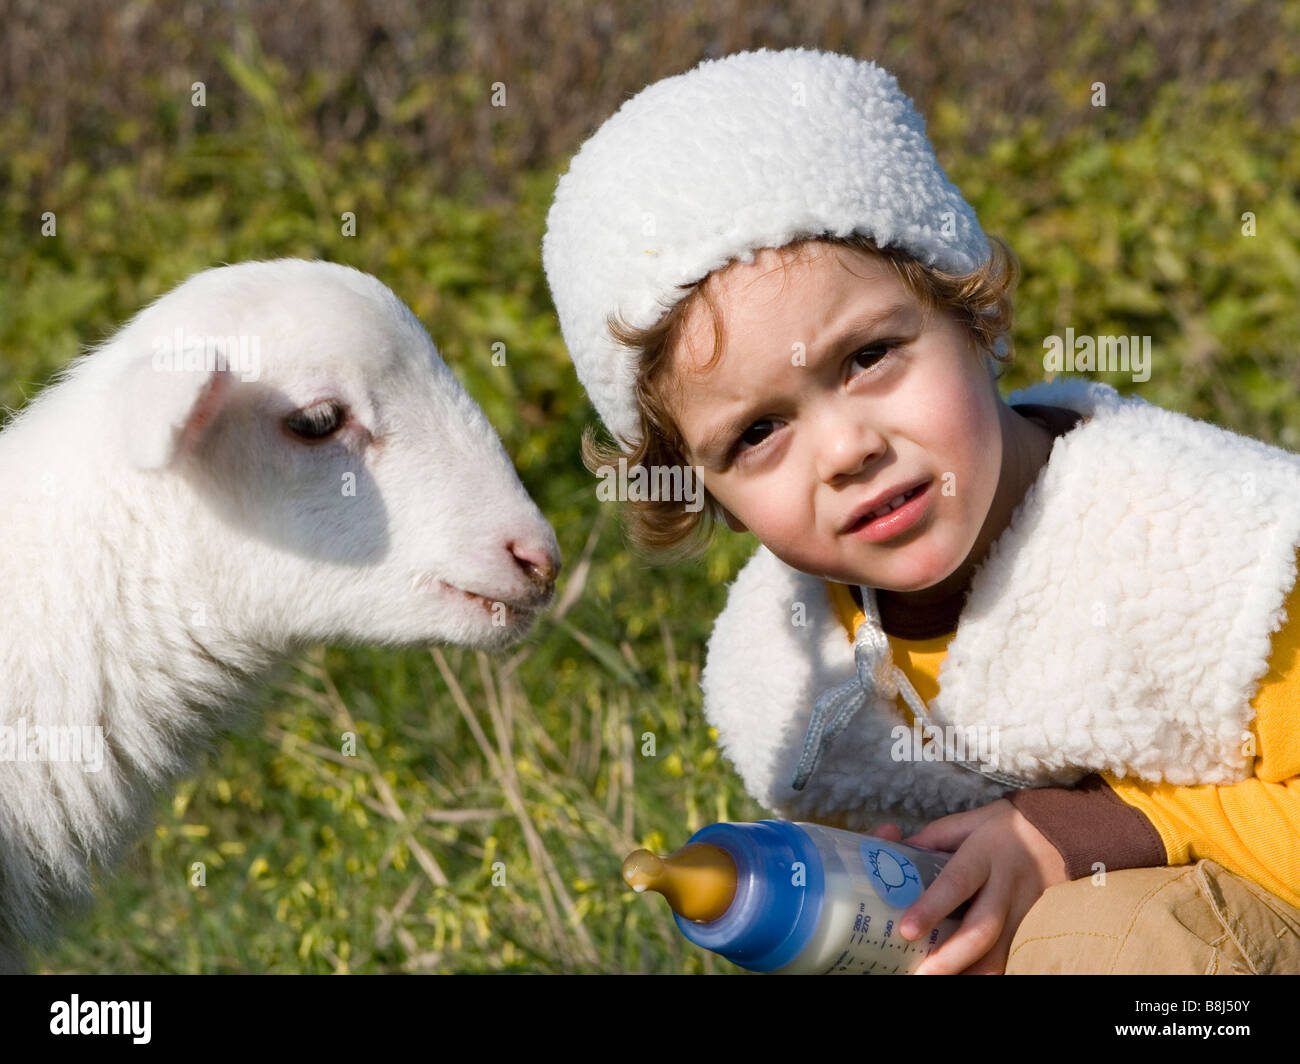 Young boy feeding lamb Stock Photo